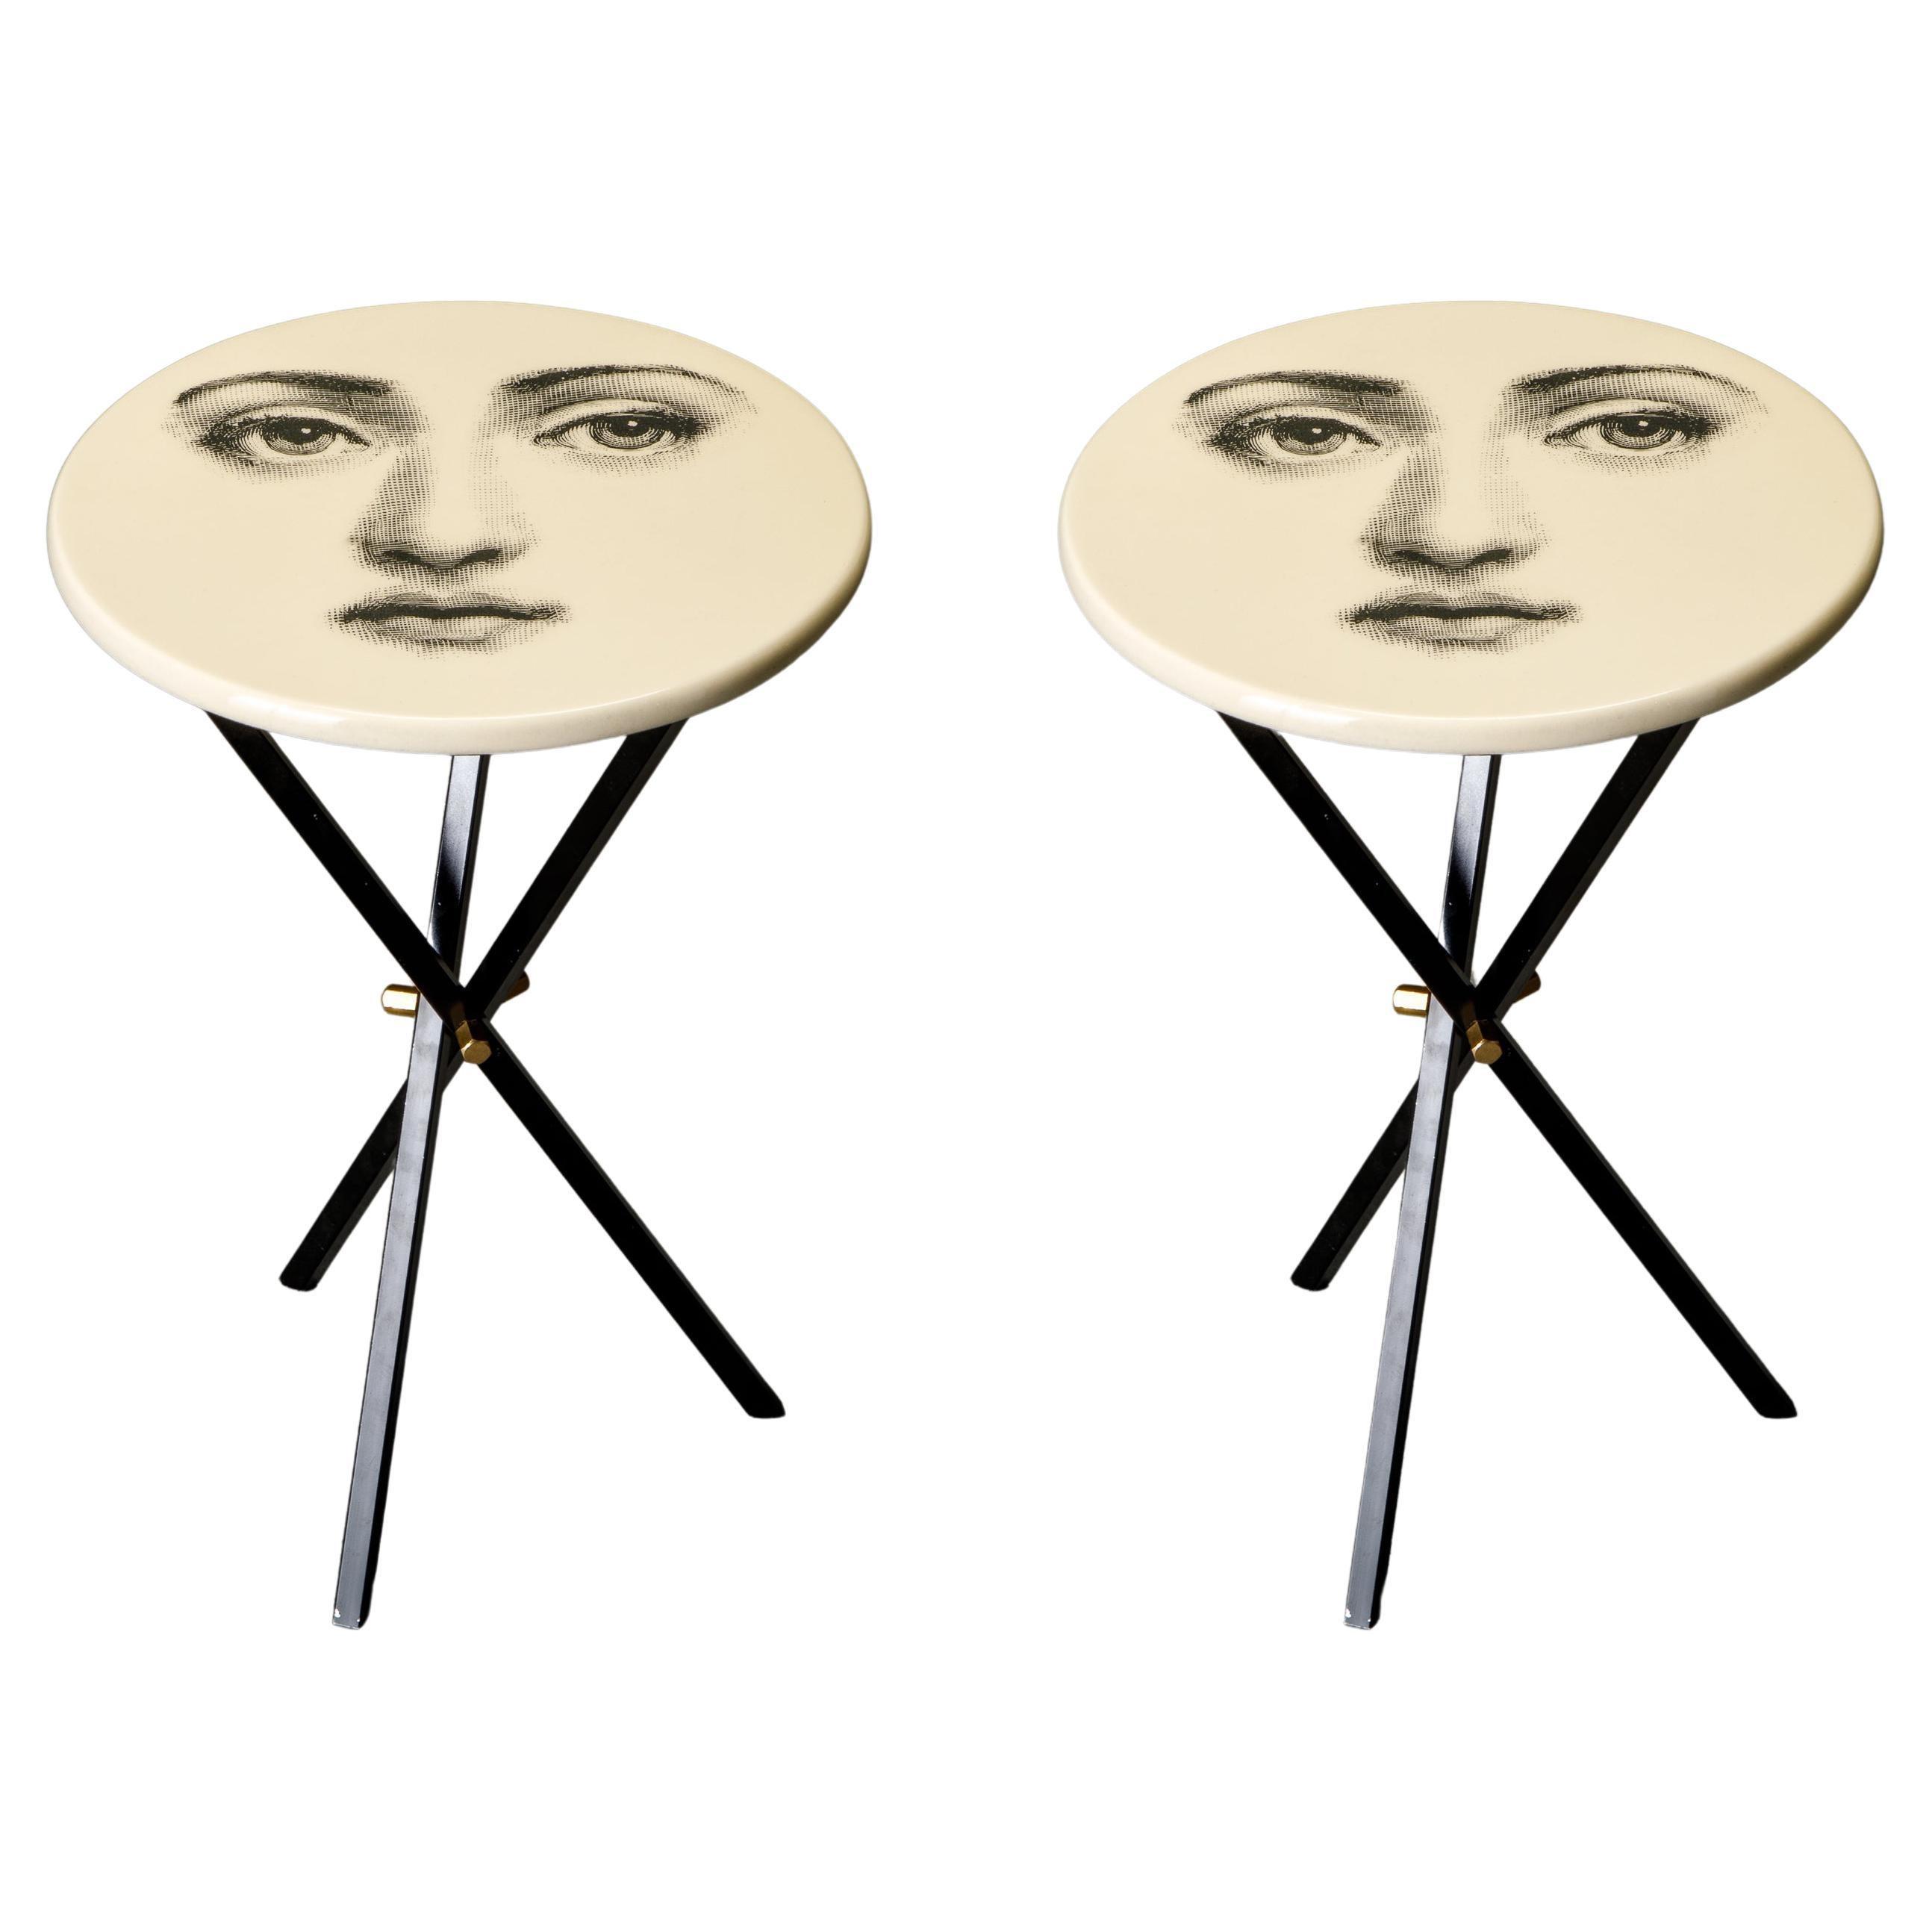 'Viso Di Donno' Pair of Side Tables by Piero Fornasetti, circa 1960s, Signed